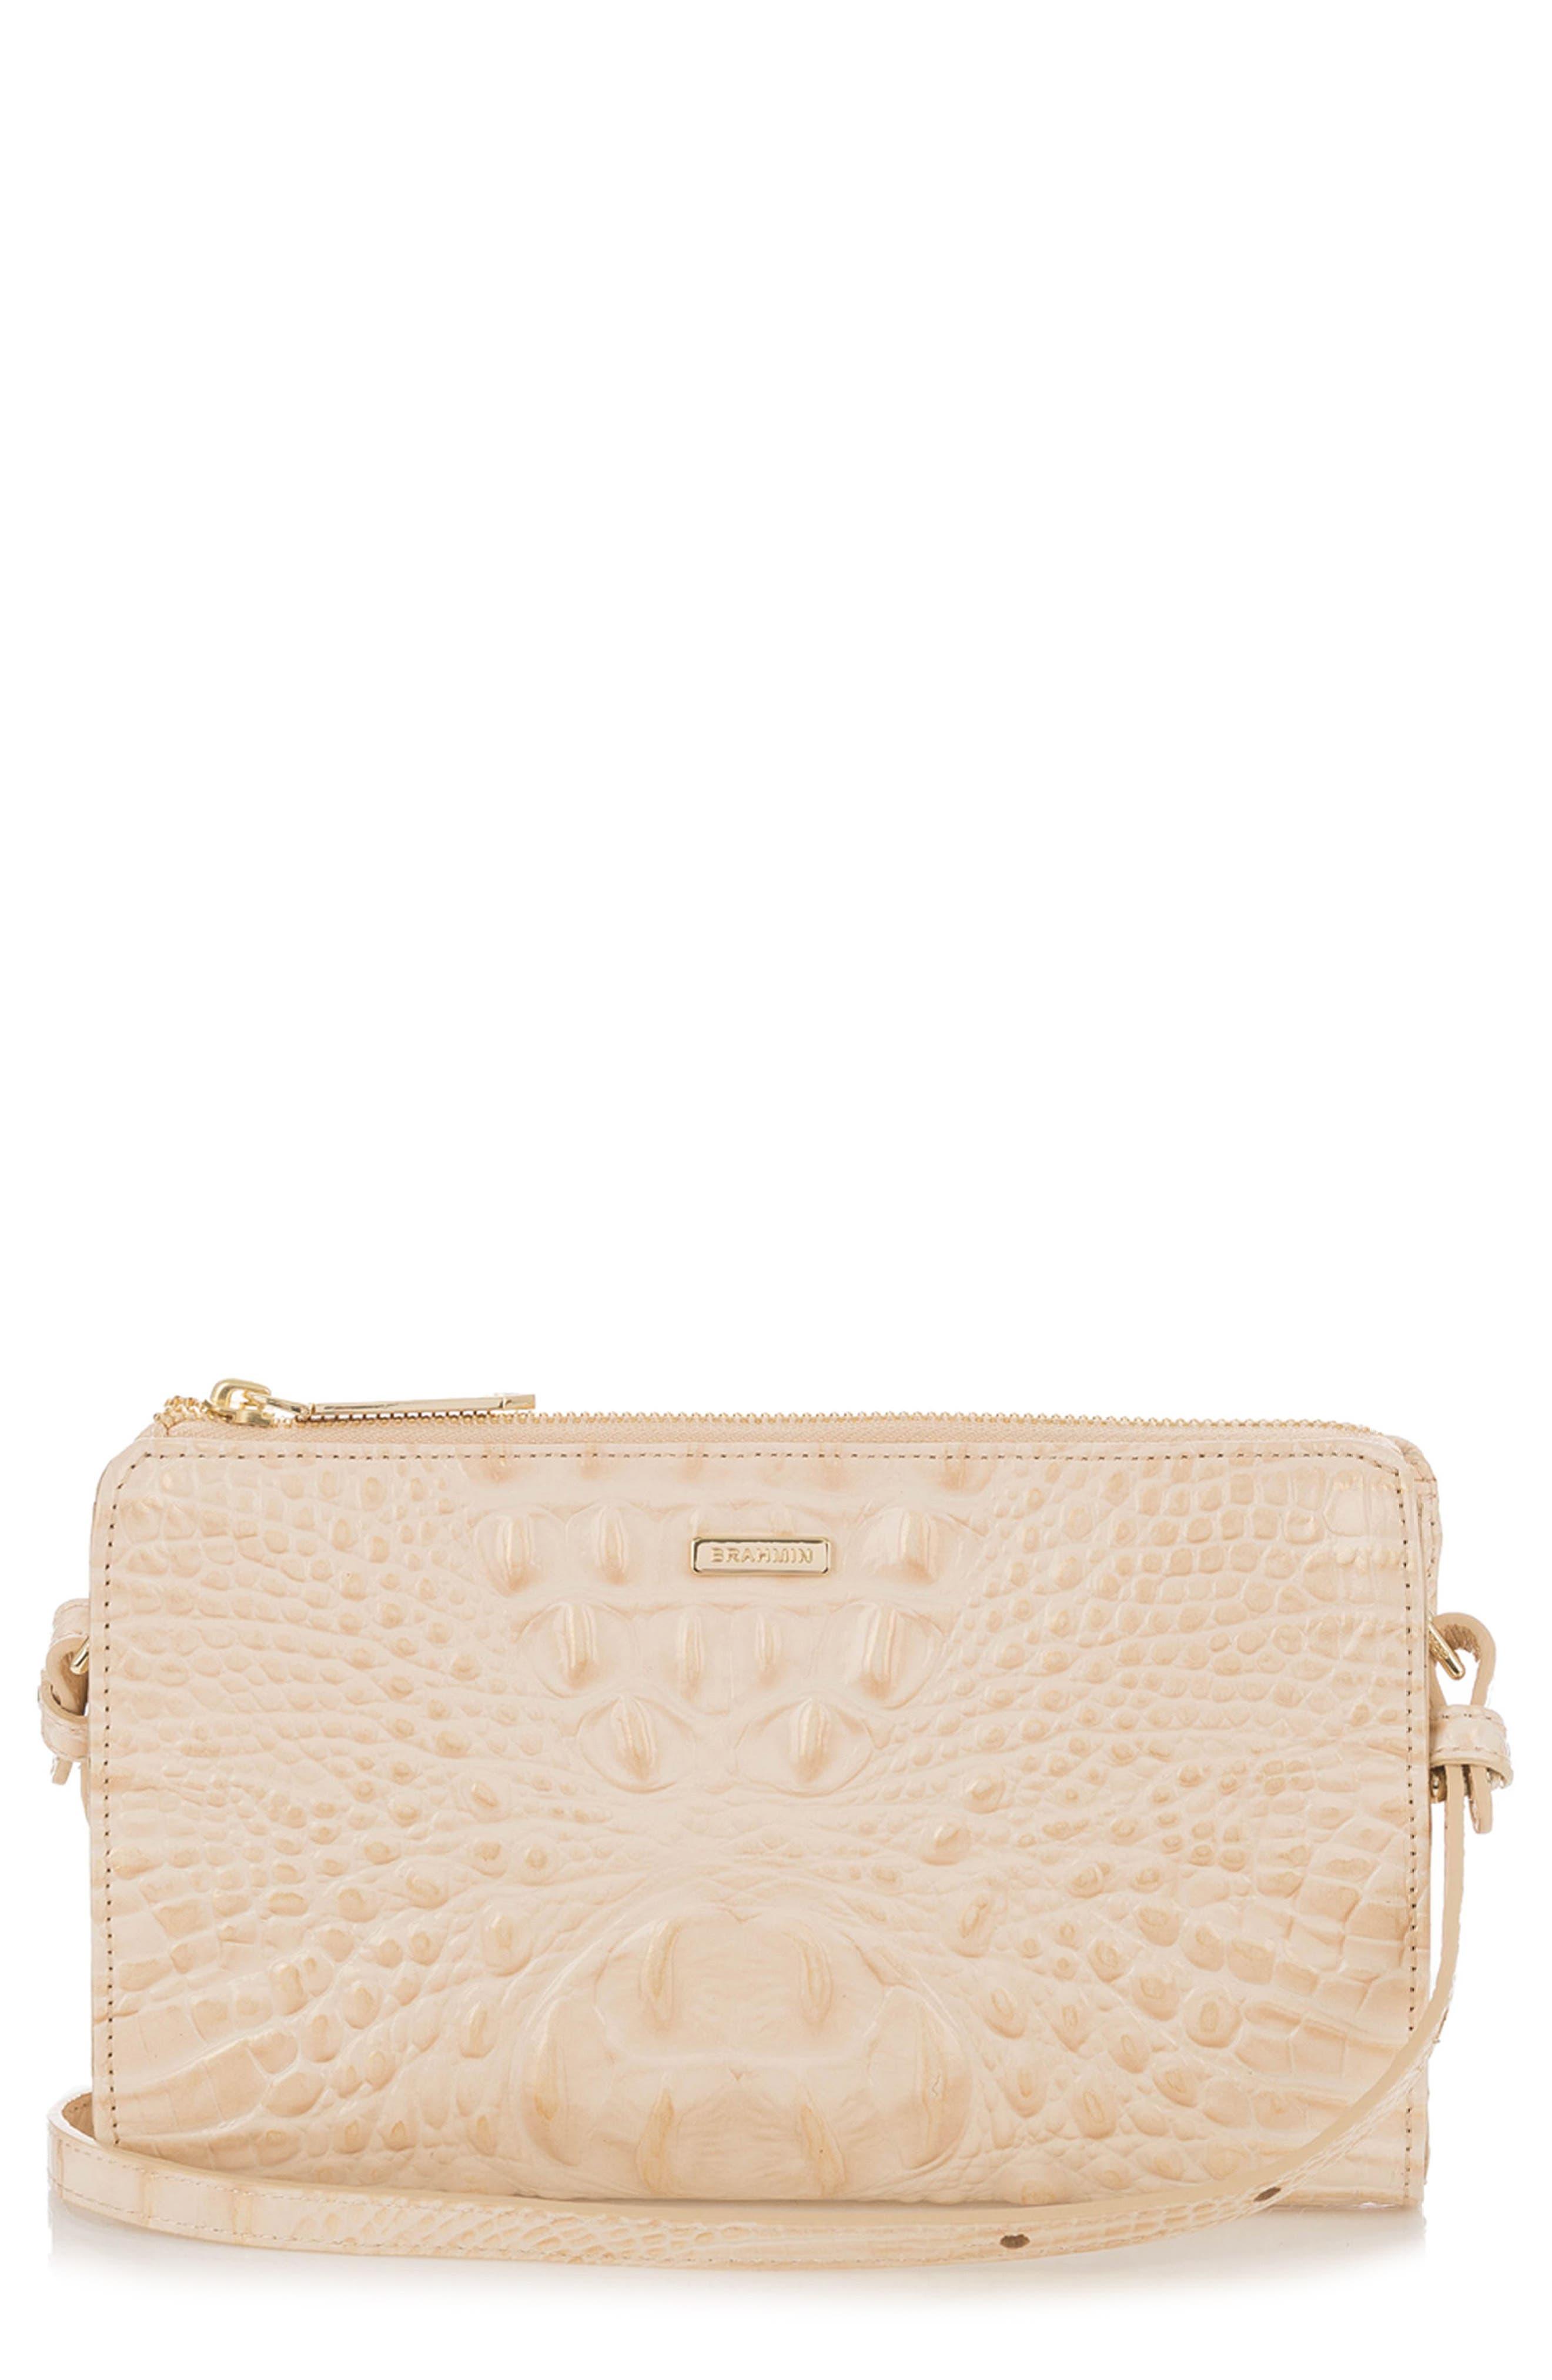 Brahmin Sienna Leather Crossbody Bag